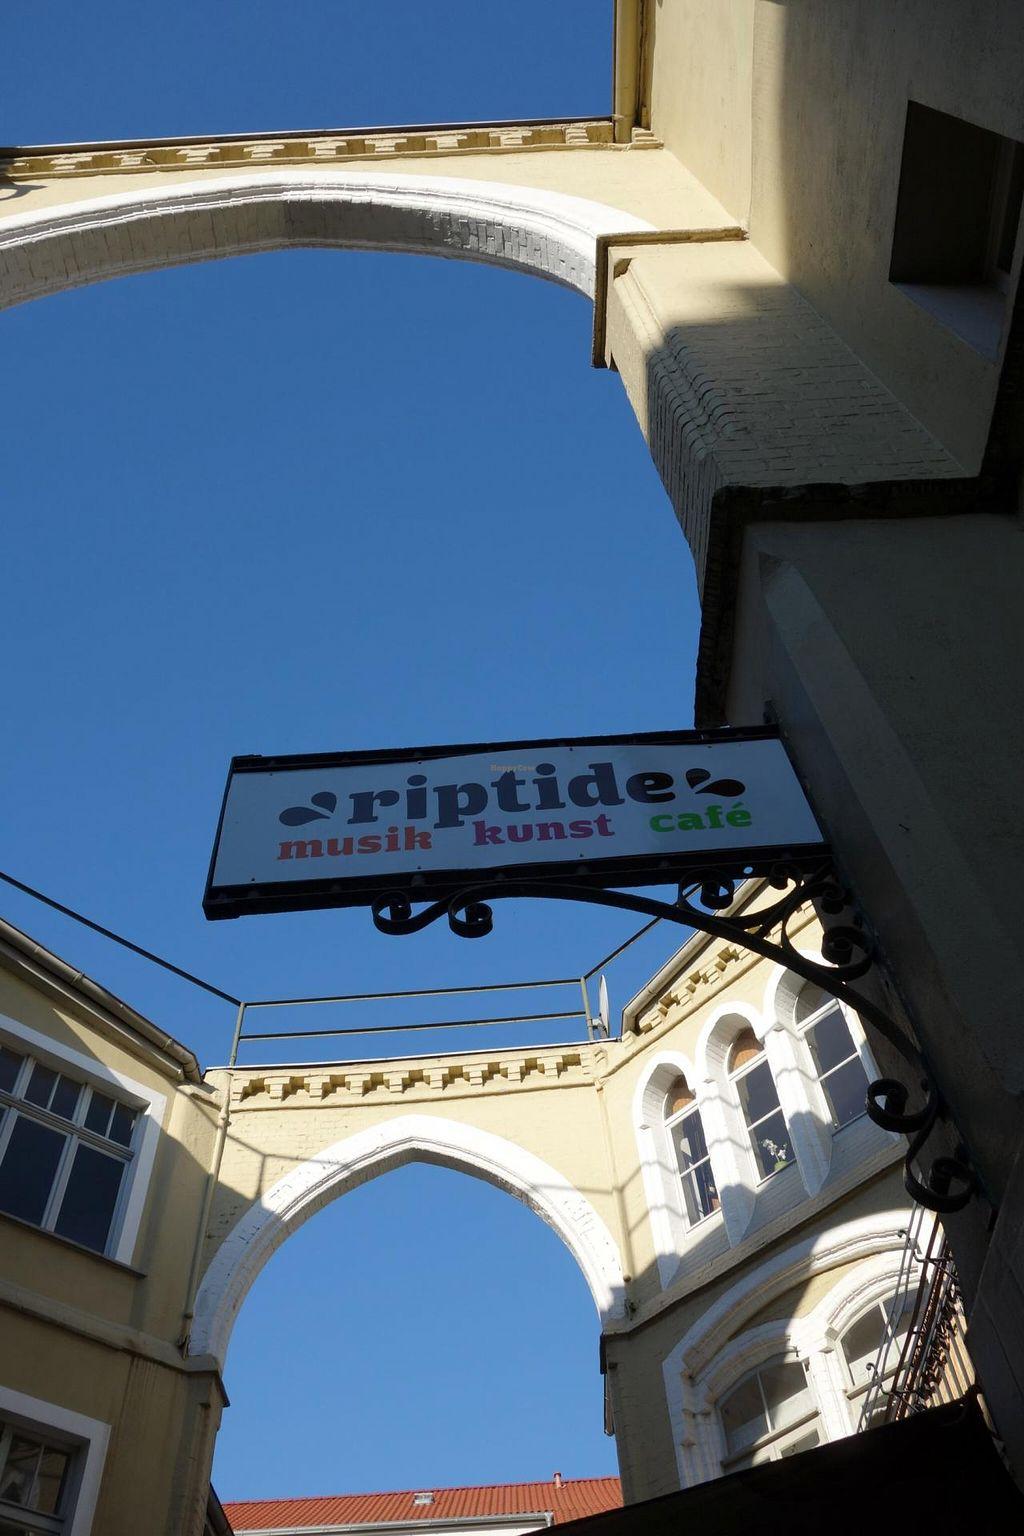 "Photo of Cafe Riptide  by <a href=""/members/profile/Gudrun"">Gudrun</a> <br/>Café Riptide <br/> June 9, 2014  - <a href='/contact/abuse/image/20667/71722'>Report</a>"